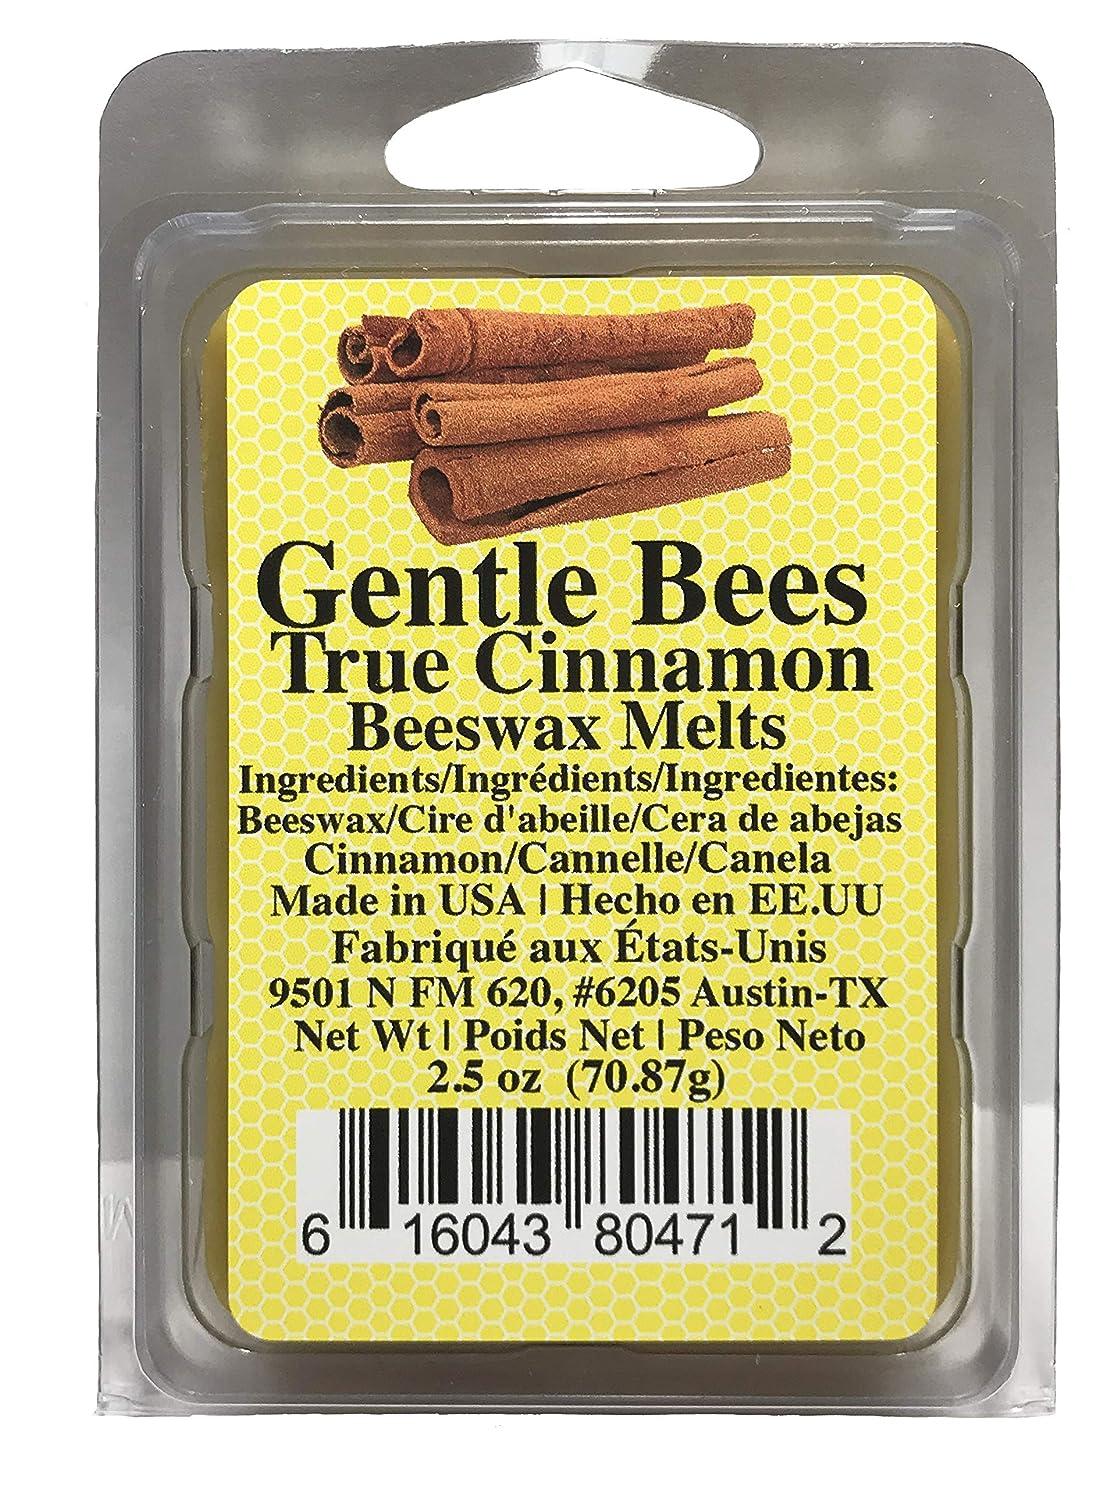 Gentle Bees Organic True Cinnamon Beeswax Melts, 2.5 Ounces